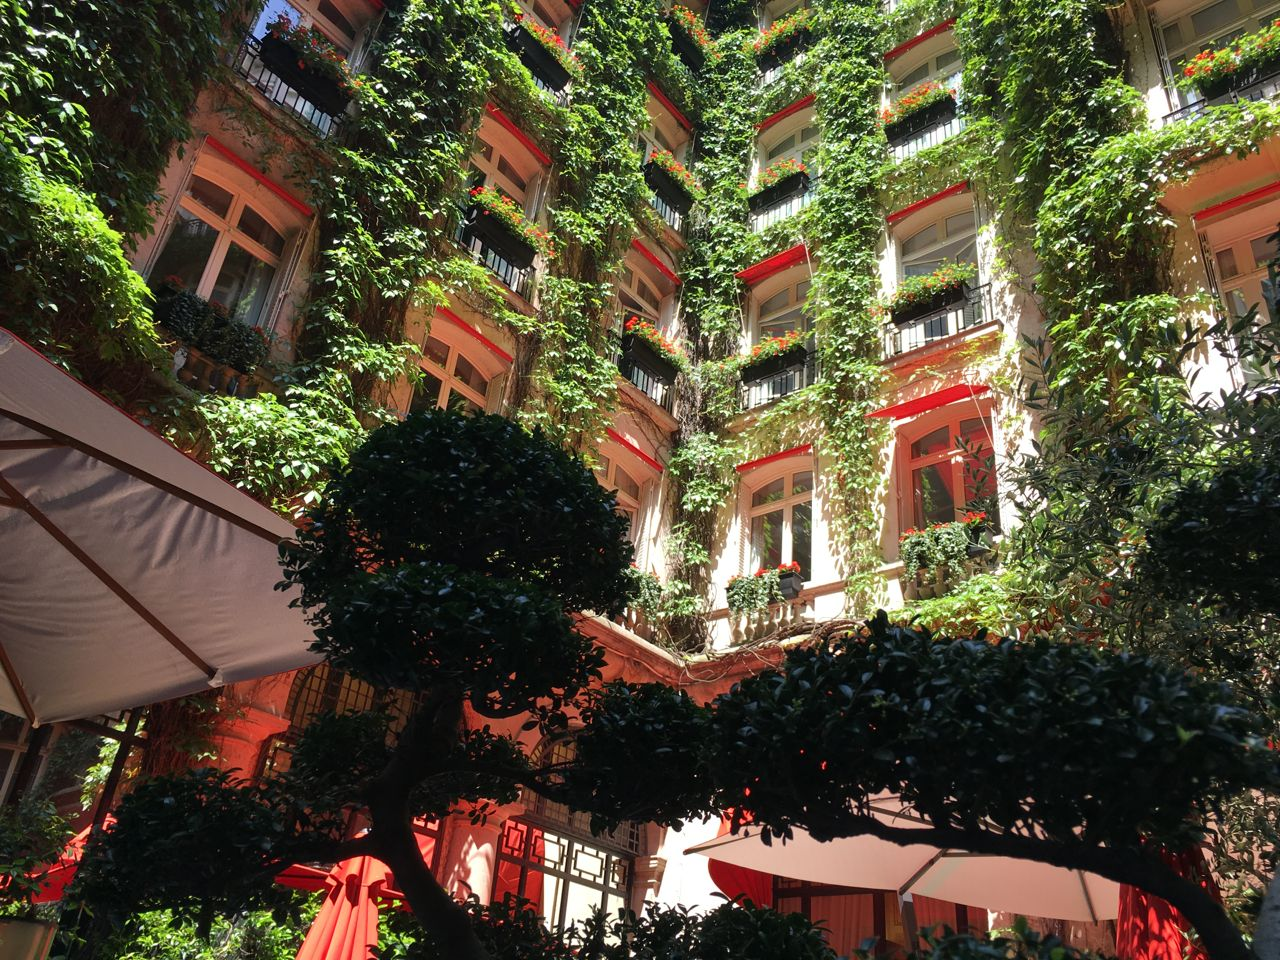 La cour jardin plaza ath n e the parisienne for Jardin plaza